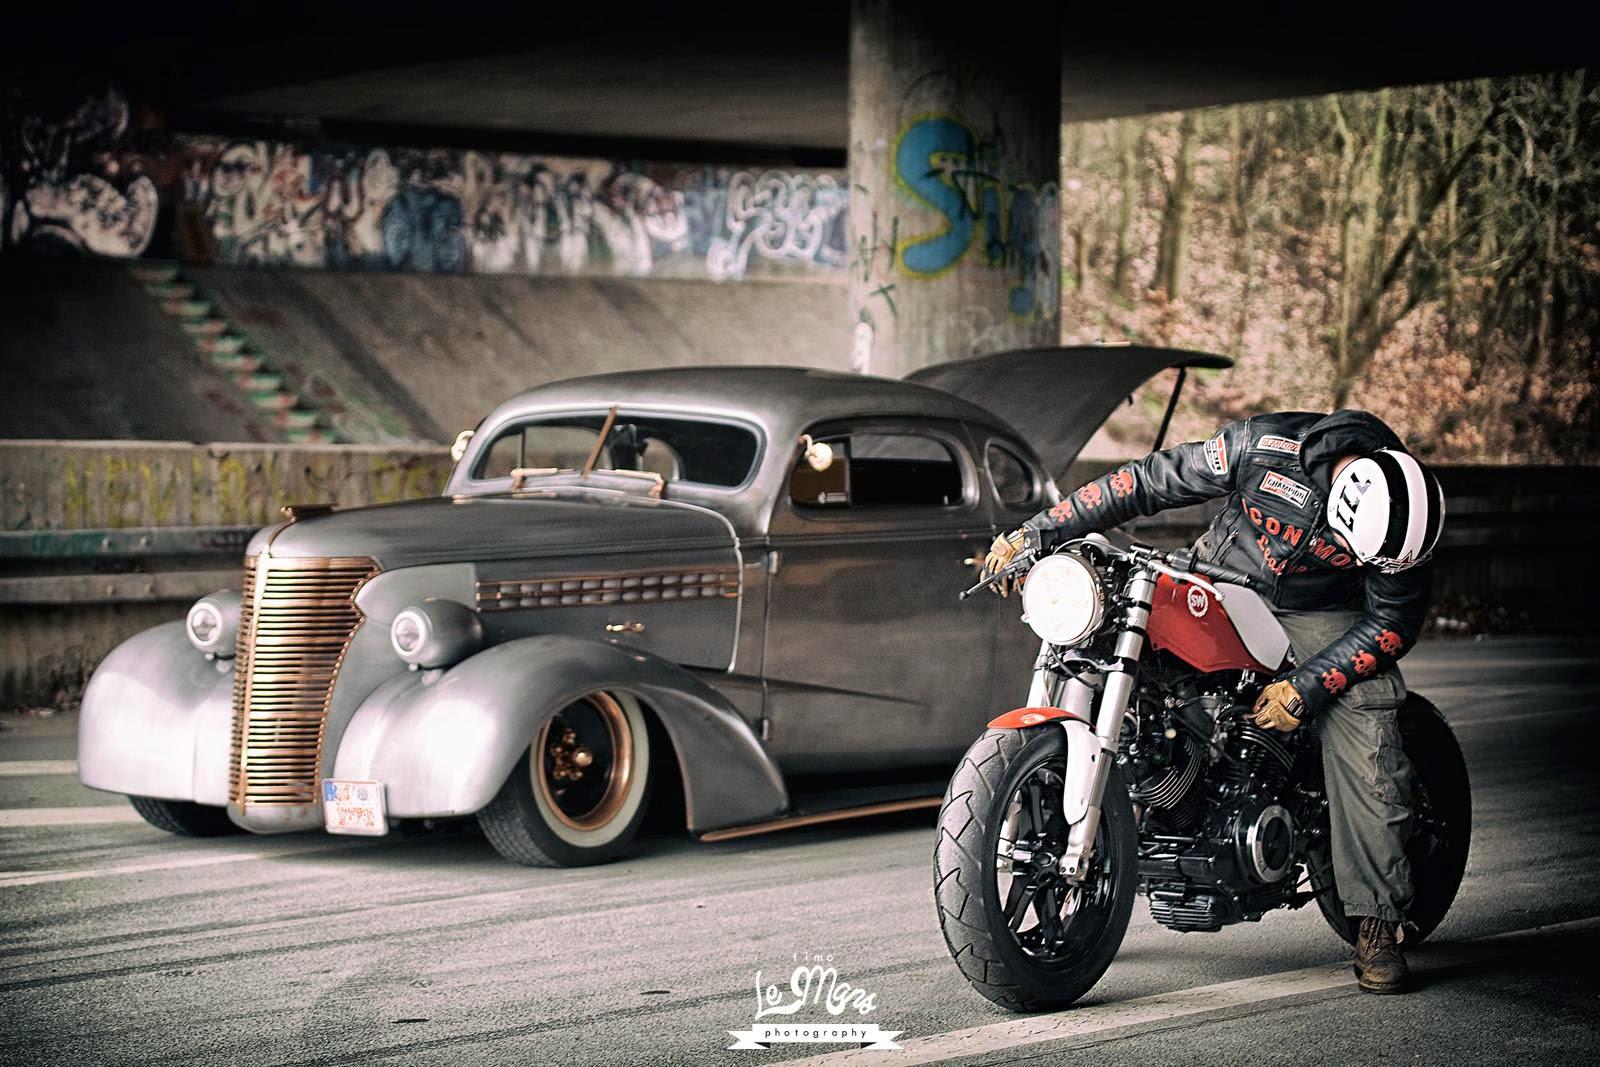 2013 08 31 archive as well Harley Davidson Street 750 Cafe Racer Rajputana Customs additionally Motorraeder Yamaha XJR 1300 4 334 in addition Roadstar Harley Davidsons Xr 750 moreover Custom Bikes. on yamaha 750 motorcycle